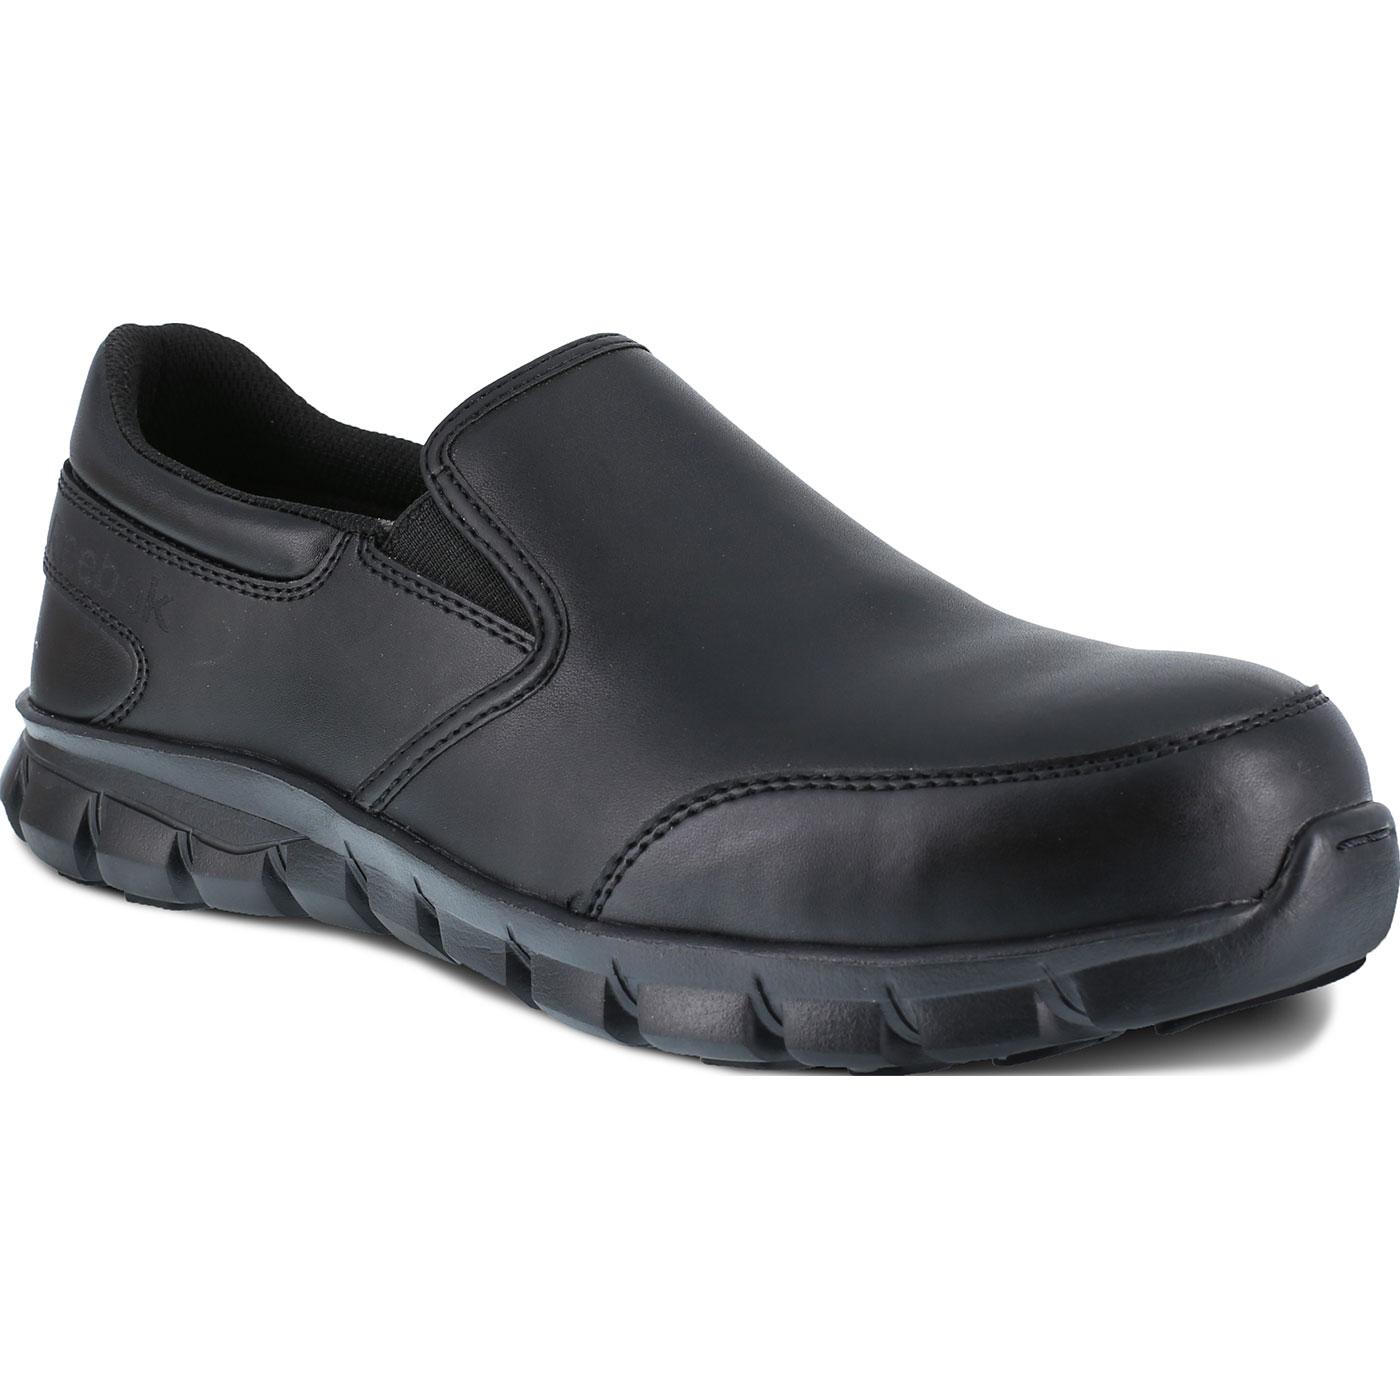 fc0f8ec5fda Reebok Sublite Cushion Work Men s Composite Toe Static Dissipative Slip-On  Oxford ShoeReebok Sublite Cushion Work Men s Composite Toe Static  Dissipative ...